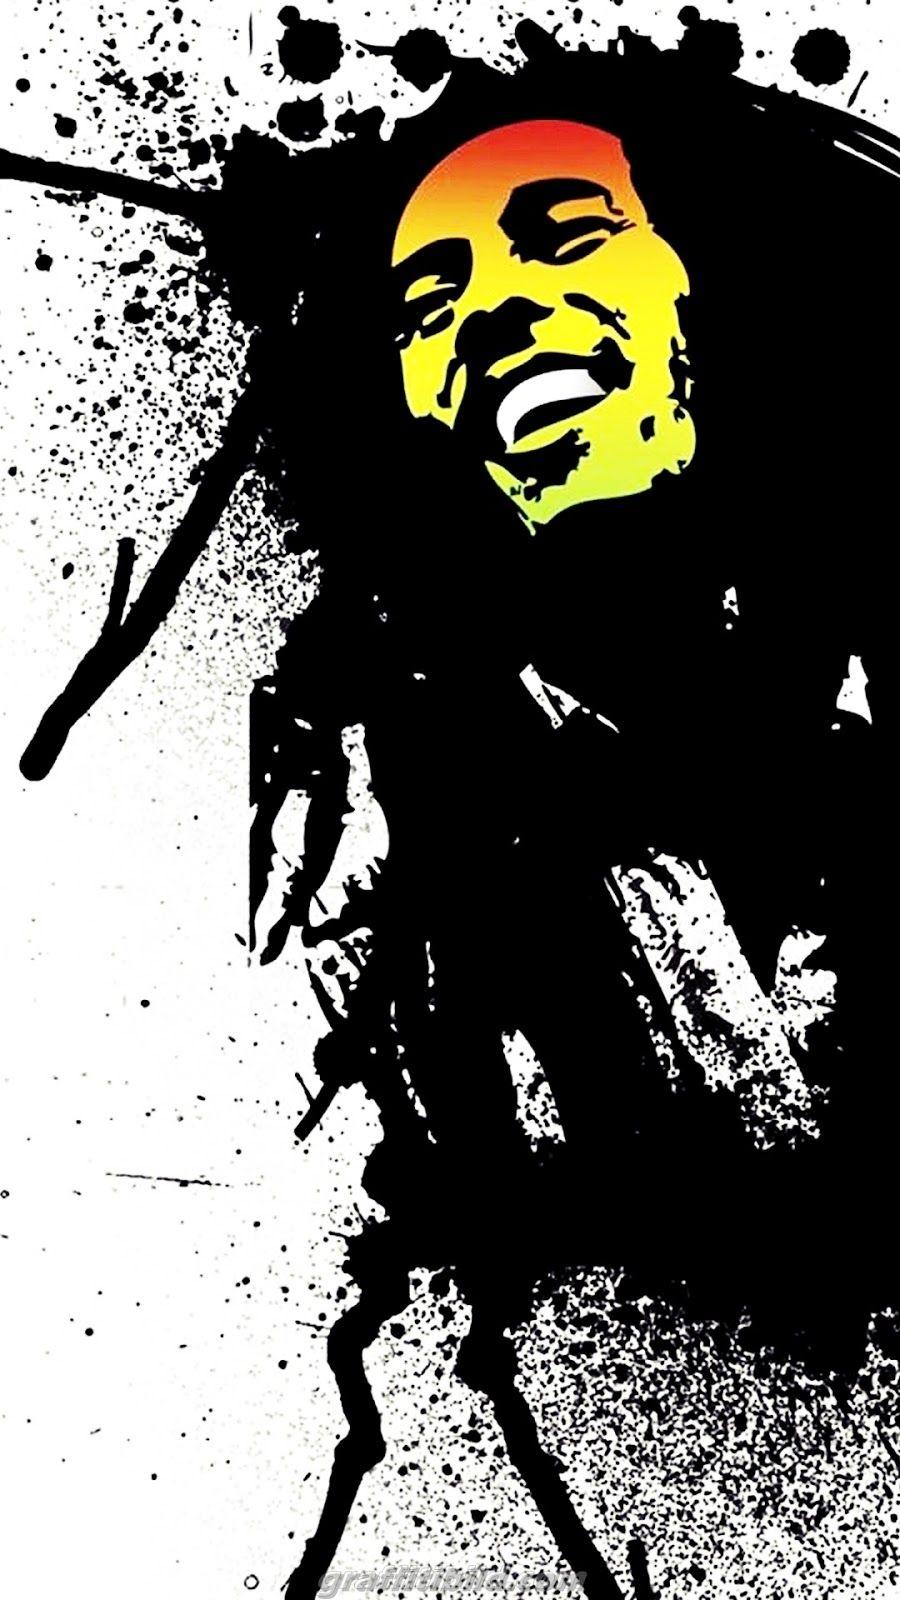 Cool Graffiti Wallpaper Hd For Android Bob Marley Kunst Graffiti Tapete Graffiti